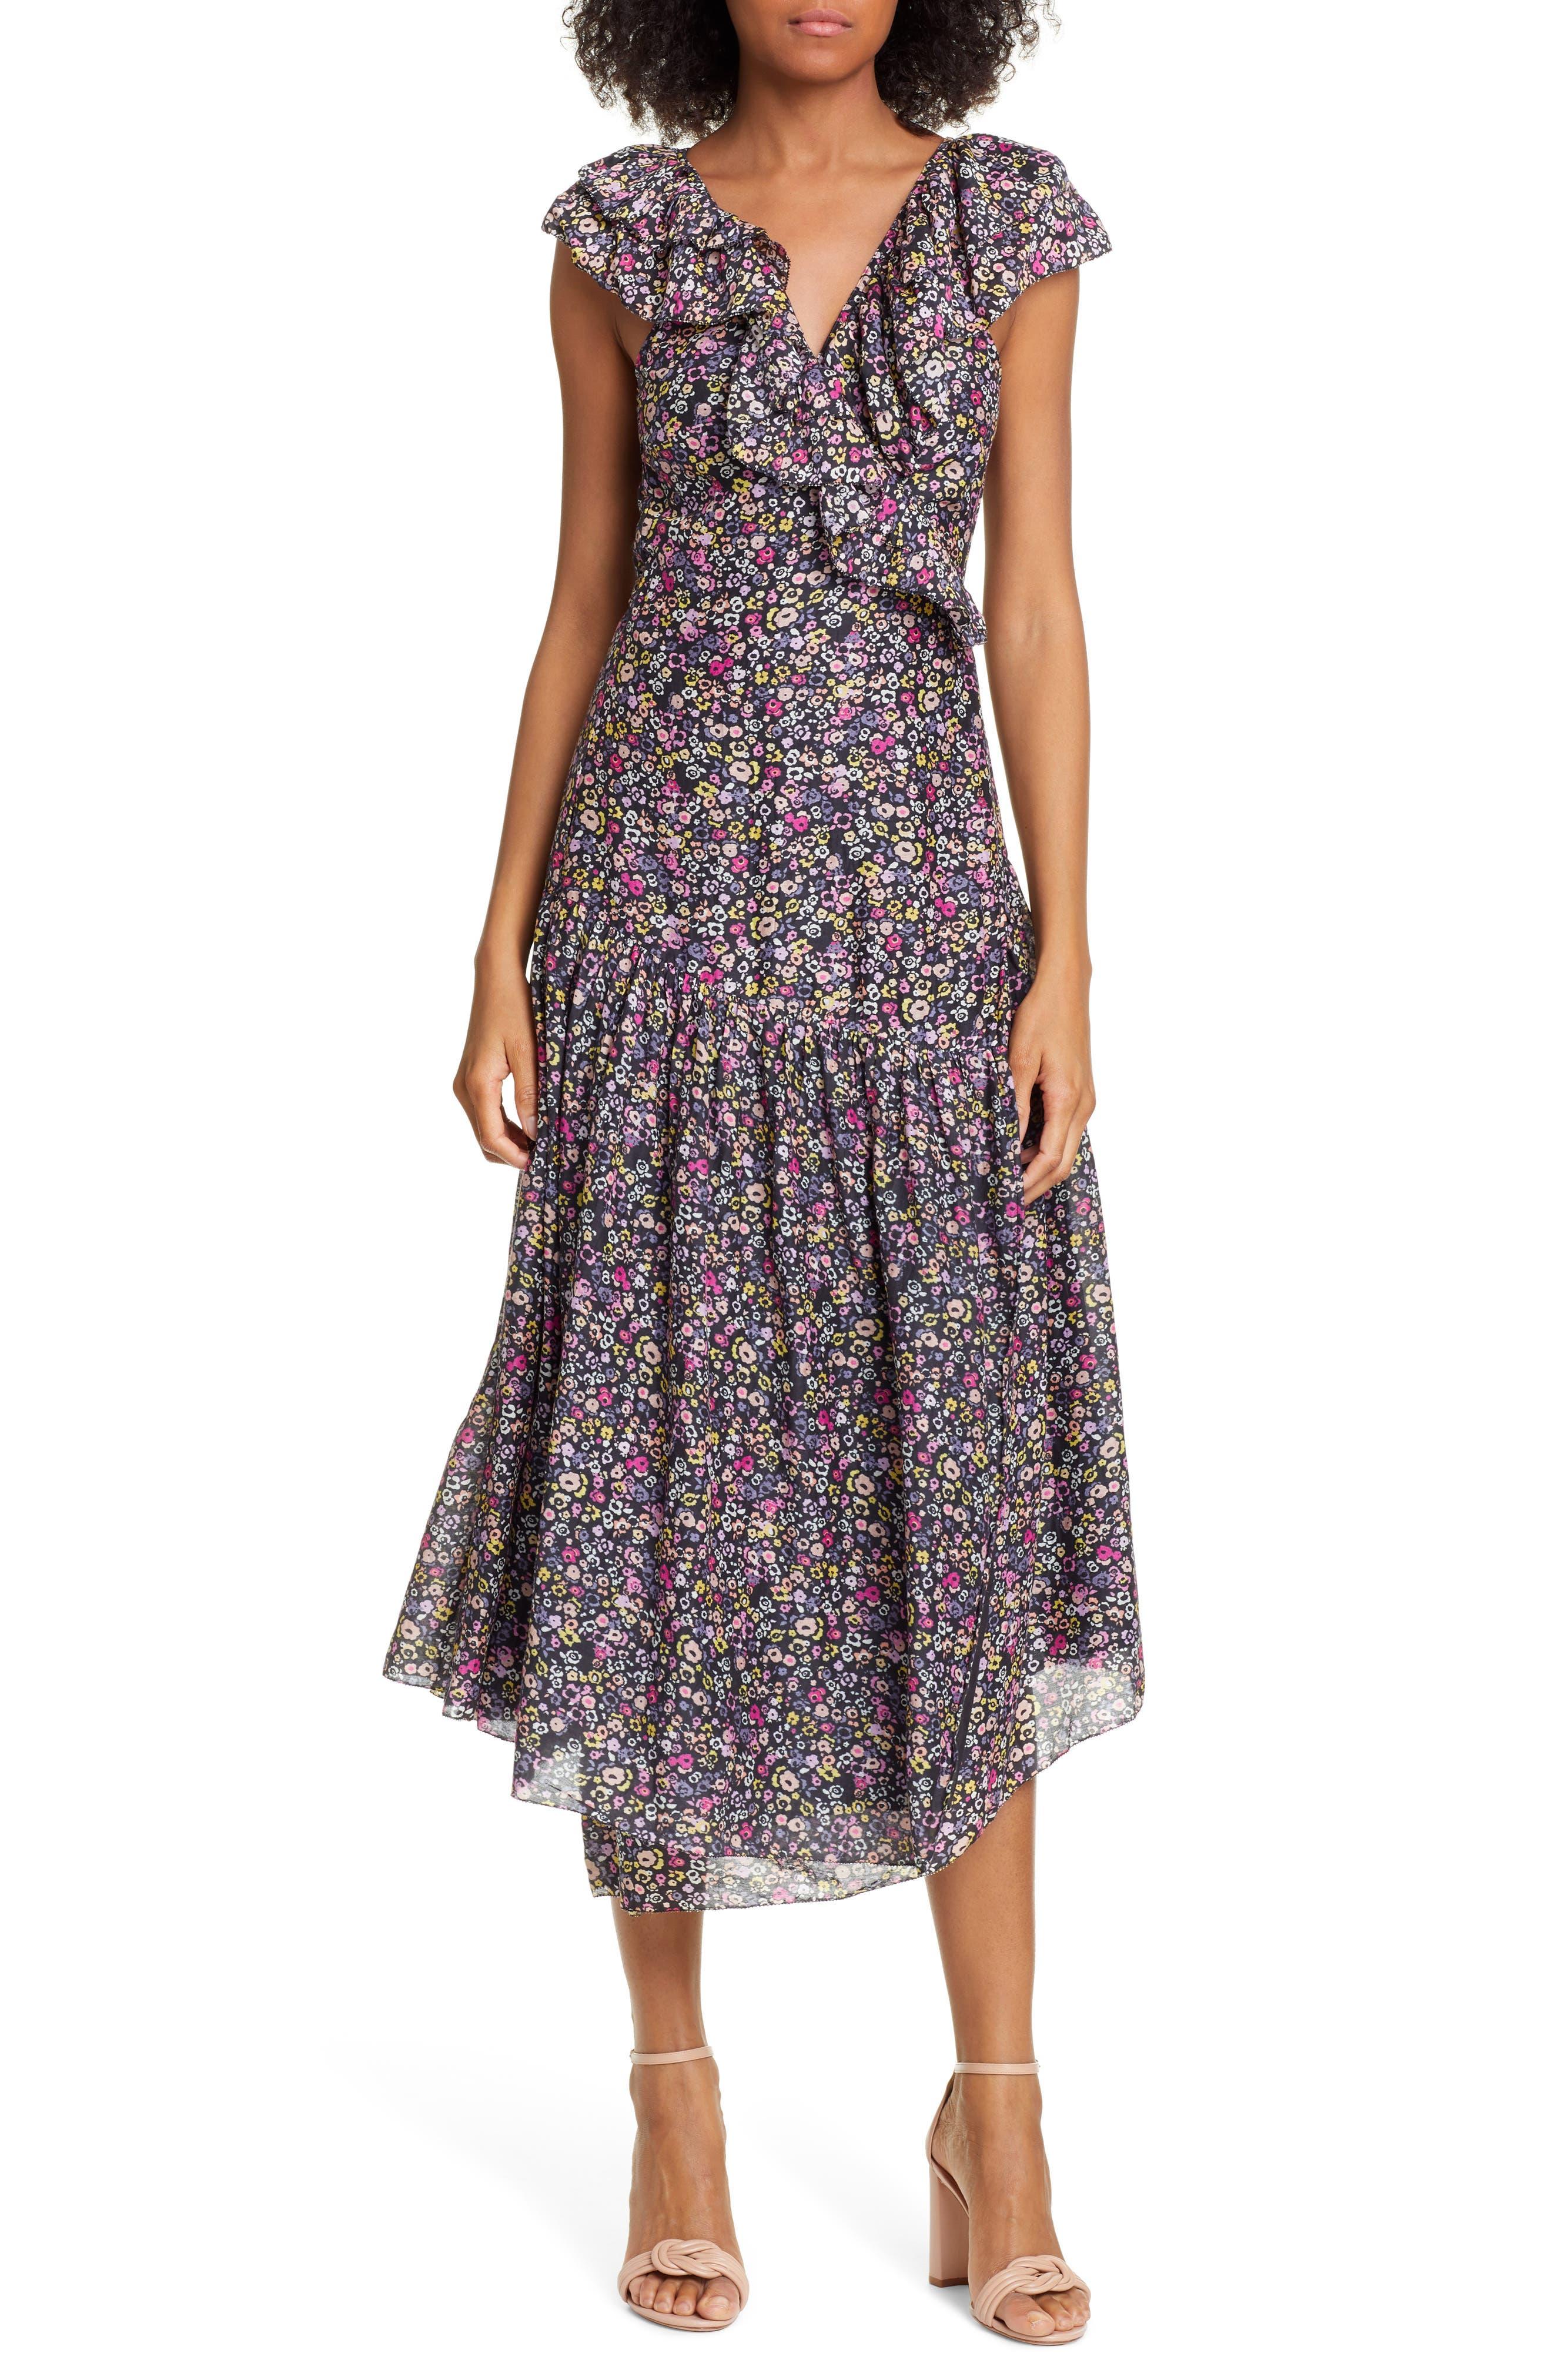 Apiece Apart Nueva Costa Floral Print Cotton & Silk Wrap Dress, Black